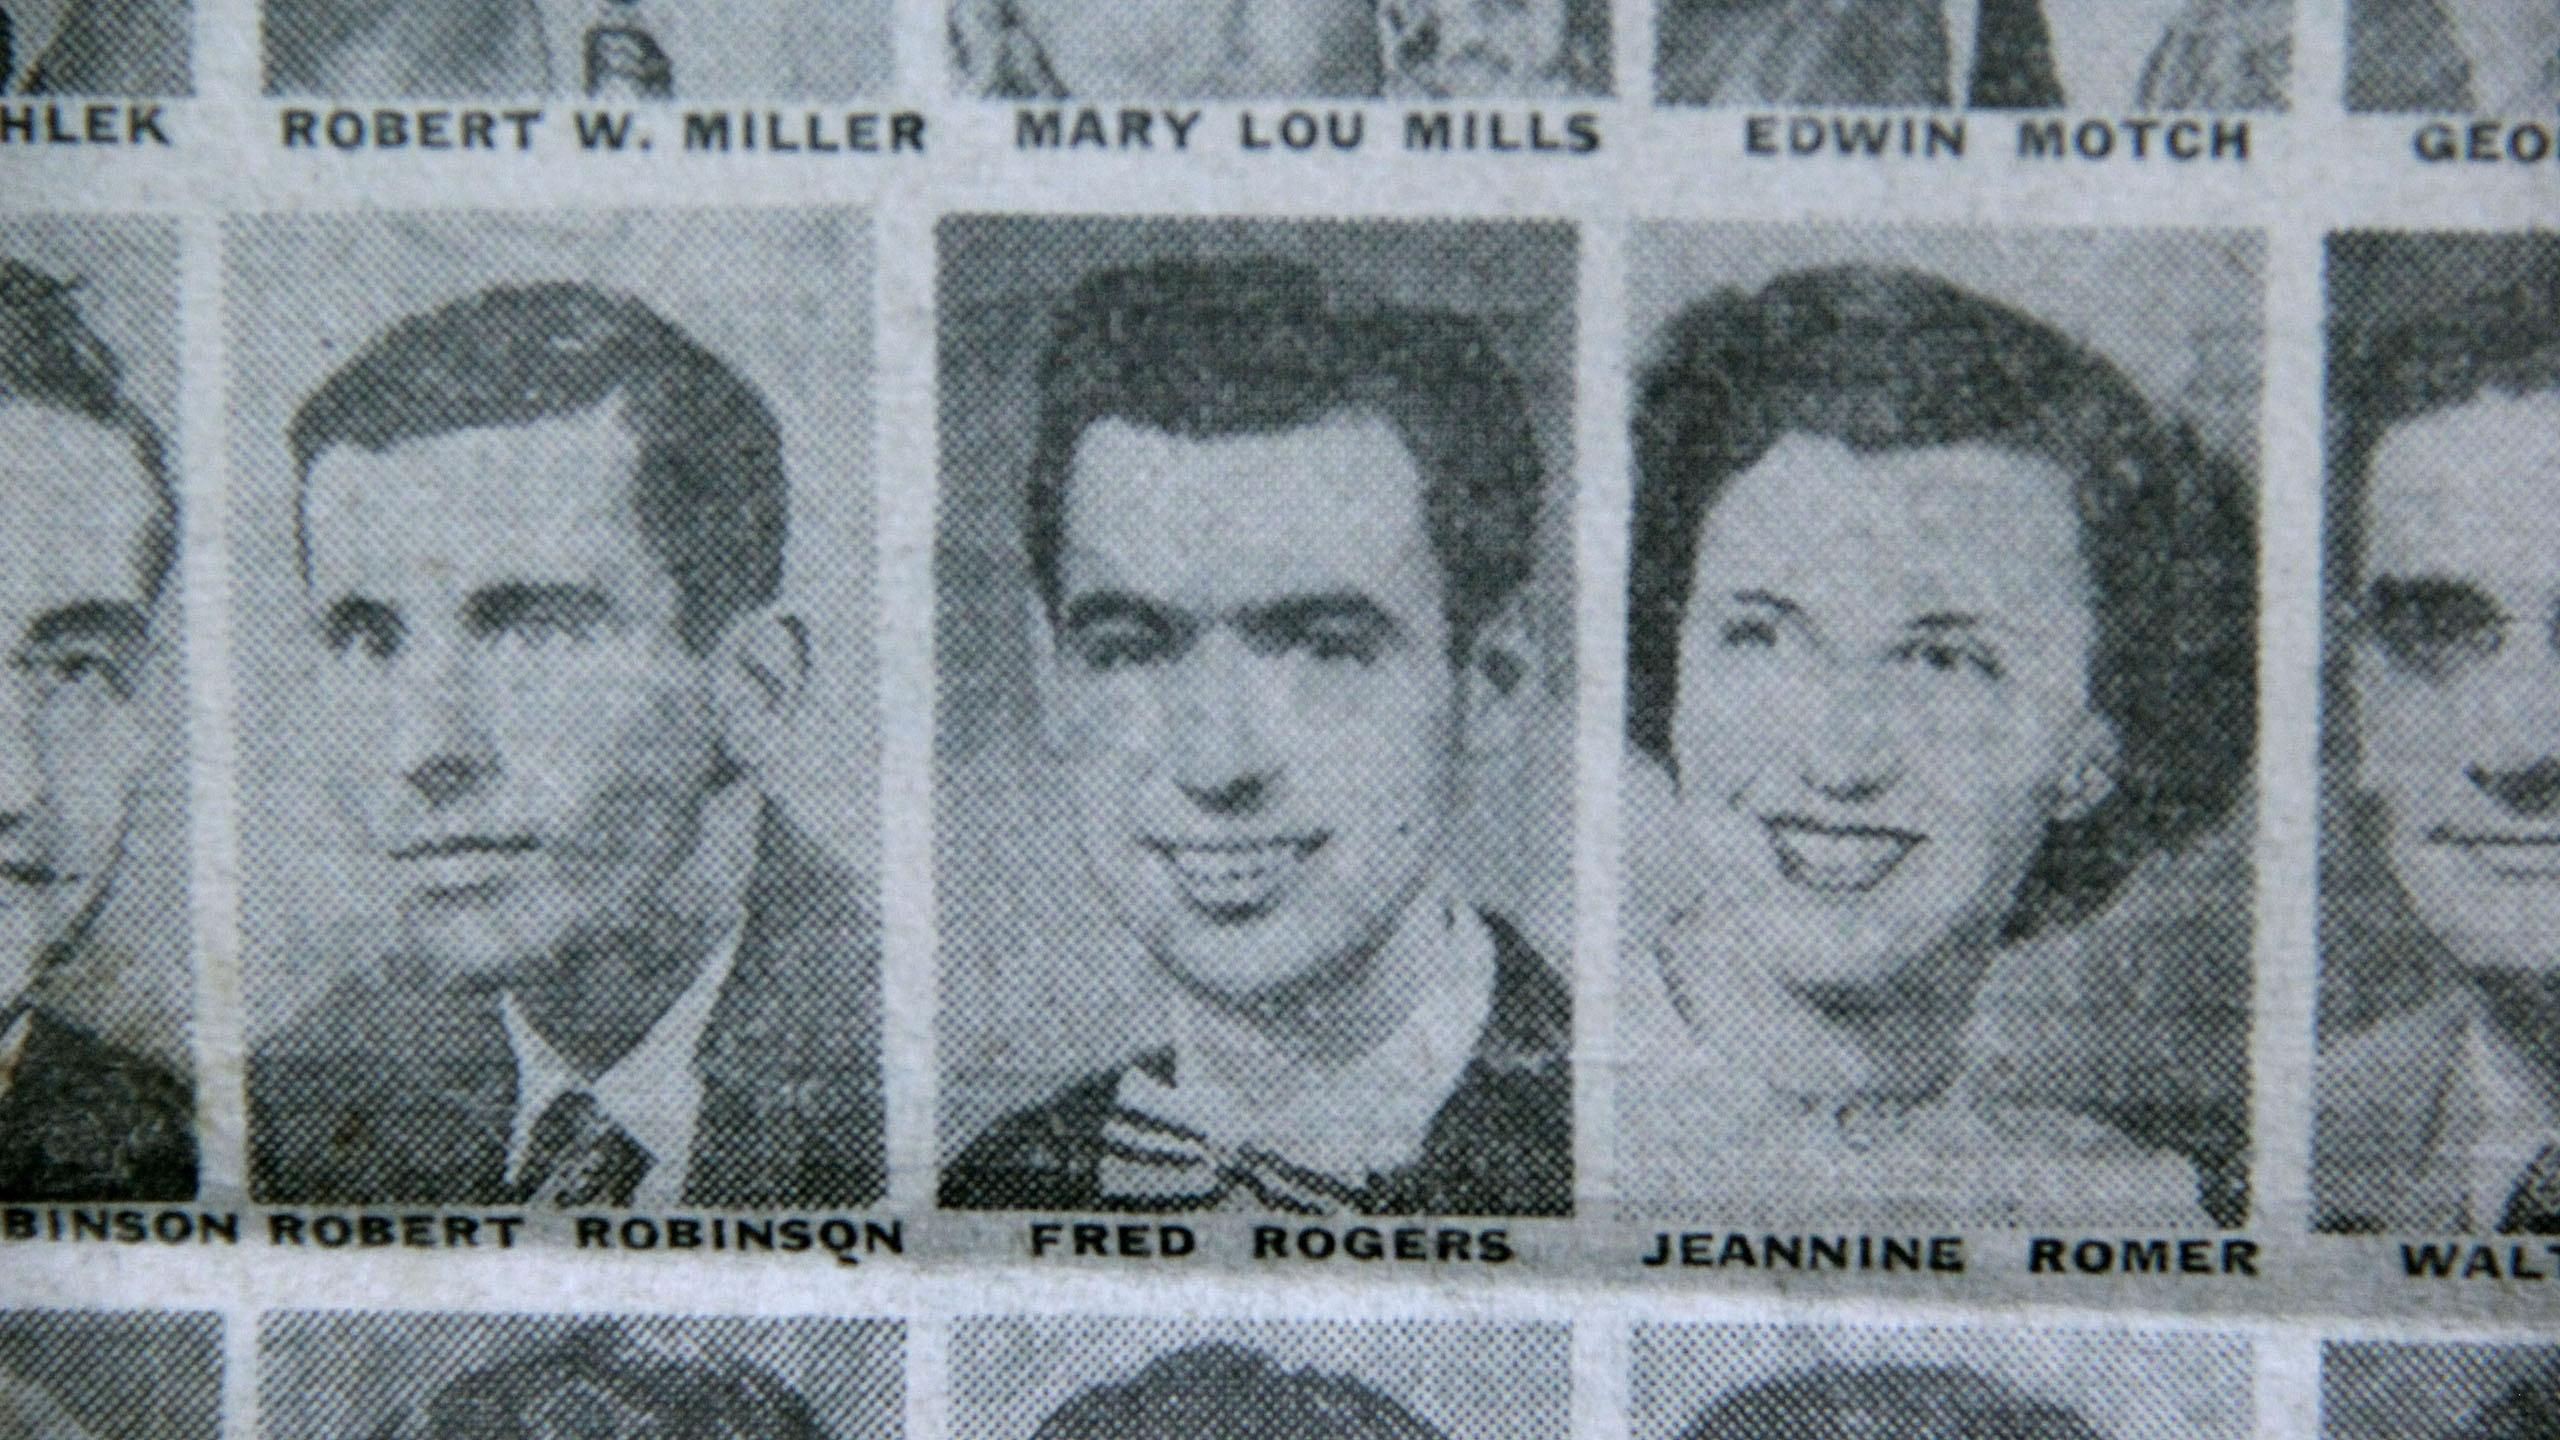 Antiques Roadshow Web Appraisal Fred Rogers Manuscripts Letter Class Photo Season 21 Pbs